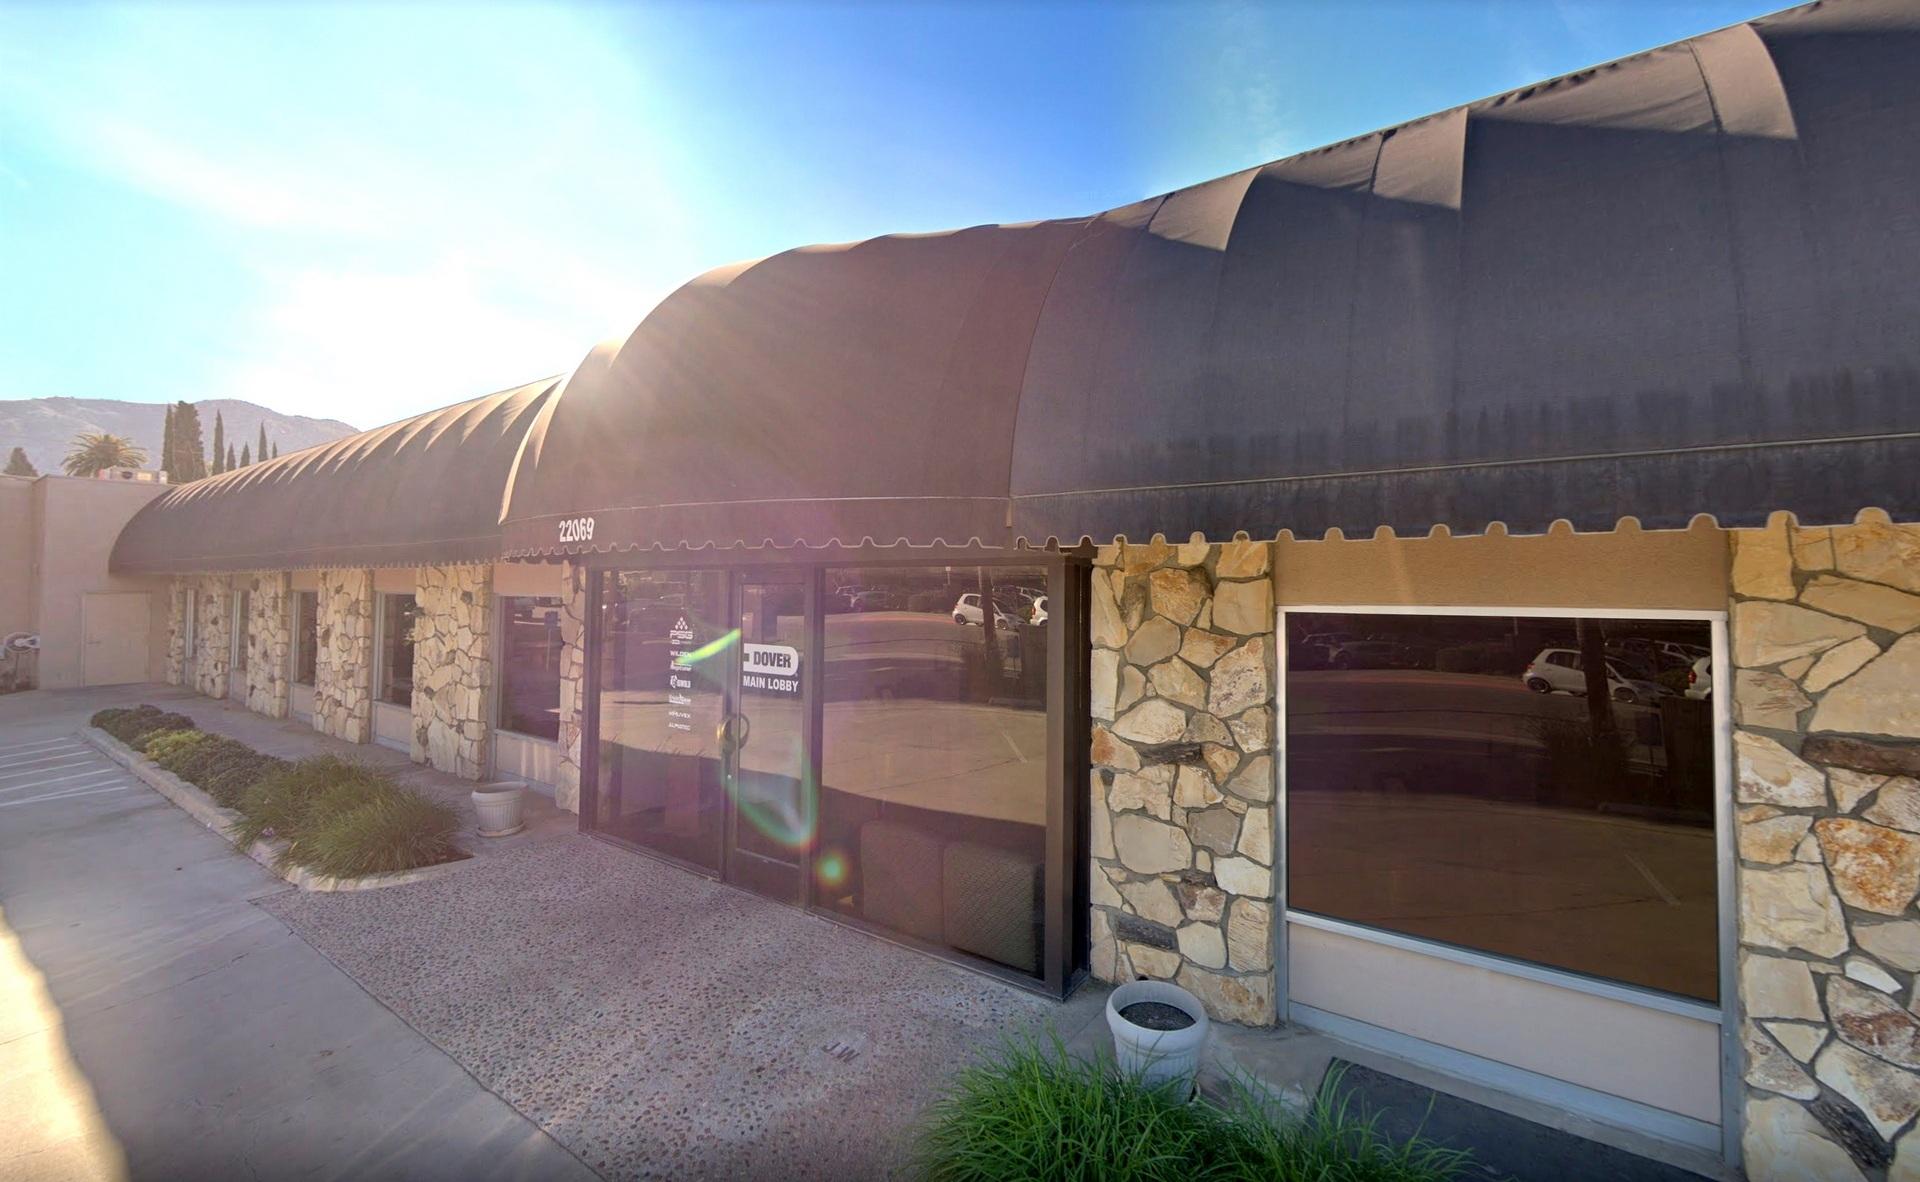 Mouvex® Opens Mouvex Americas in Grand Terrace, CA Facility, Mouvex Opens Mouvex Americas, Mouvex Opens Mouvex America IN CA, Mouvex Opens Mouvex Americas in California, Mouvex Americas in CA, Mouvex Americas in Grand Terrace, Mouvex Opens Mouvex Americas in CA